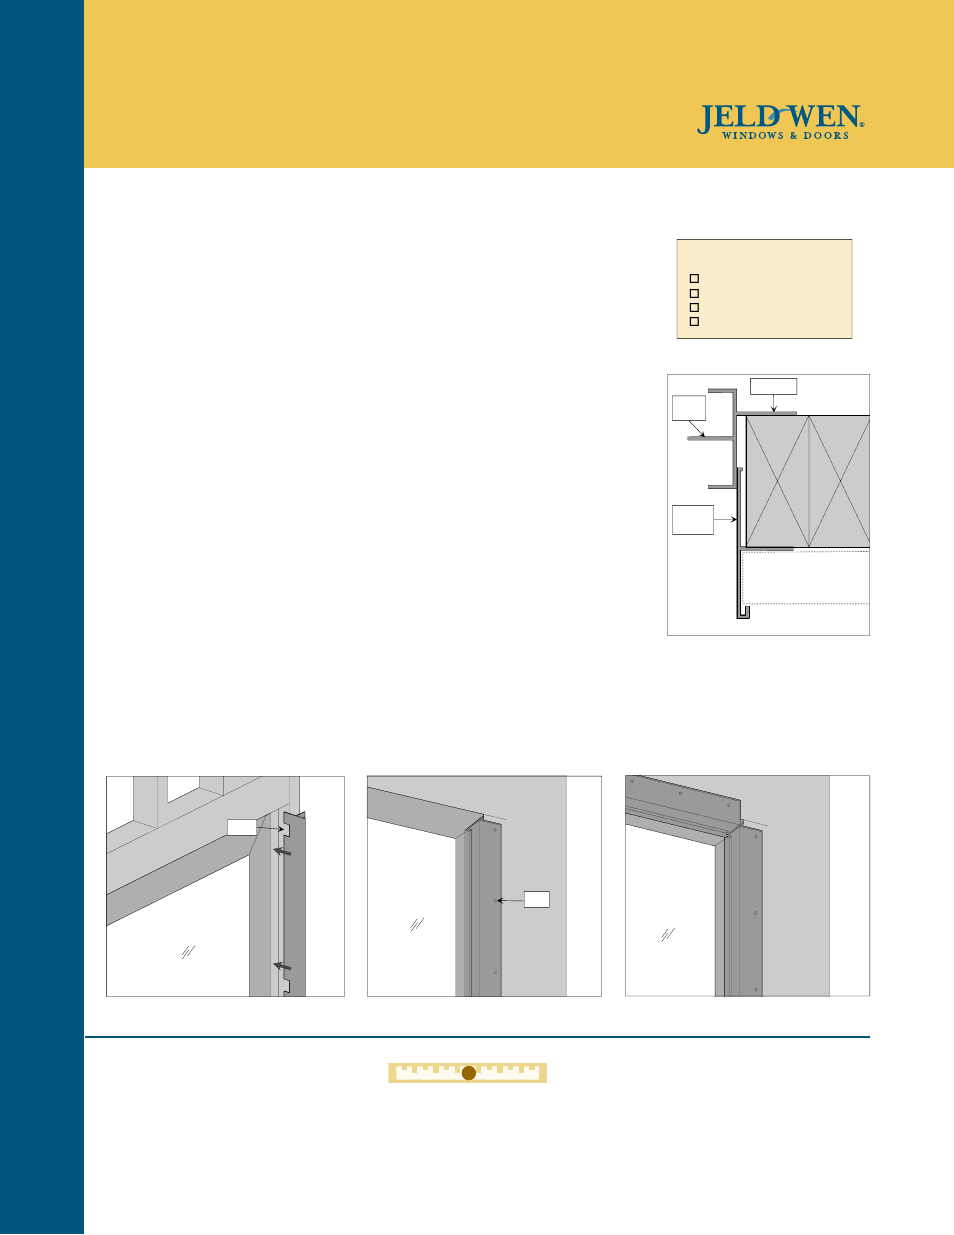 Jeld wen siv002 aluminum extension jamb for vinyl patio doors user jeld wen siv002 aluminum extension jamb for vinyl patio doors user manual 1 page planetlyrics Choice Image